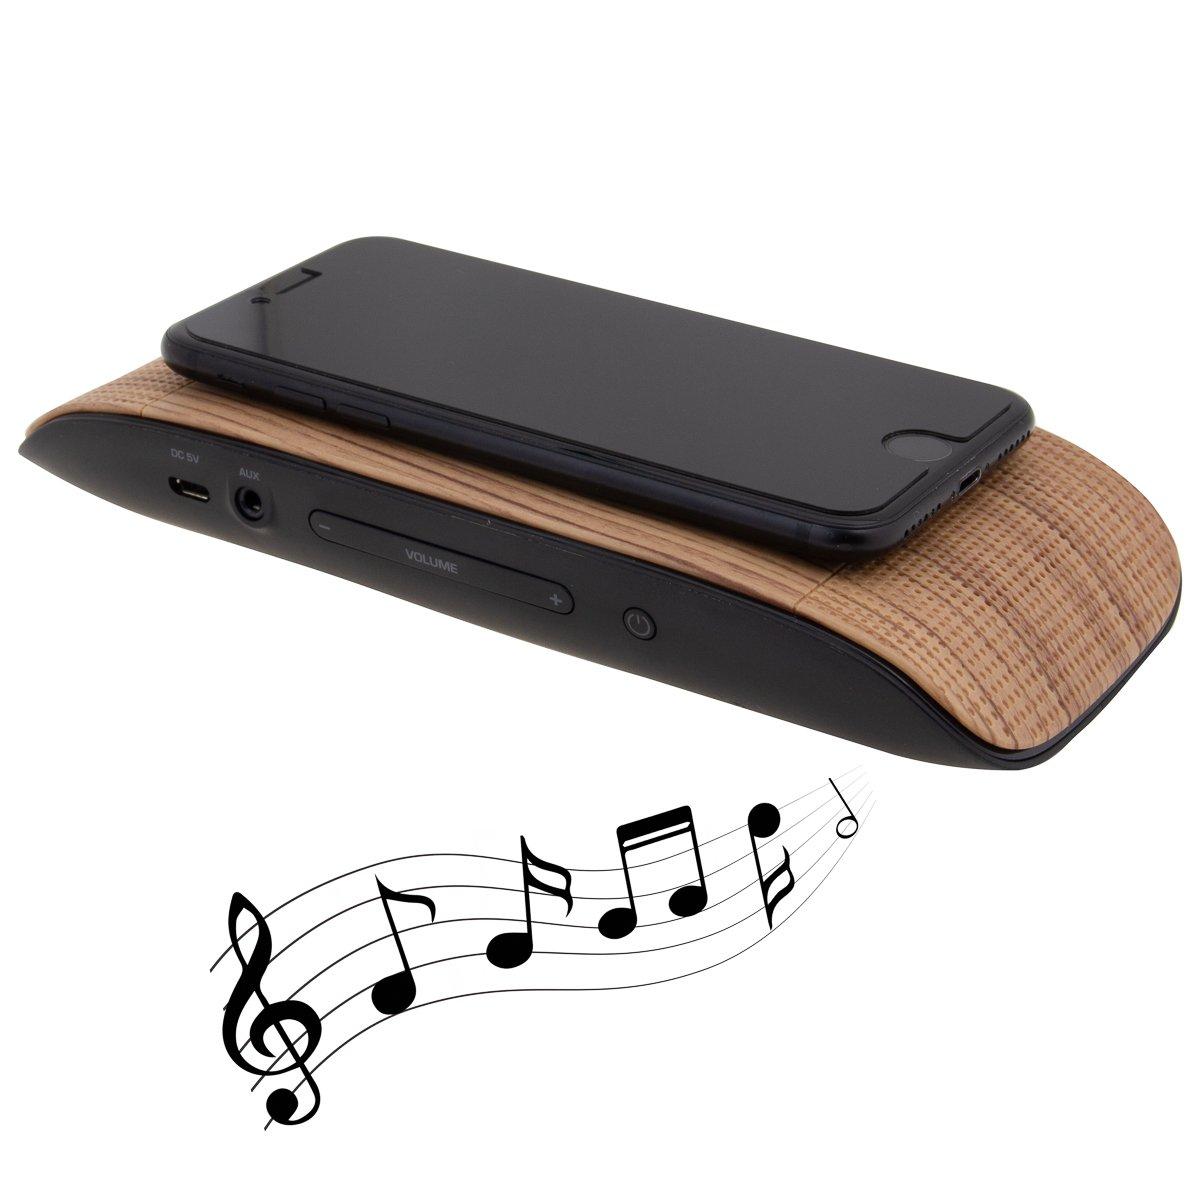 Soundflow Soundboard Wireless Portable Speaker presto, no pairing, no wires, no setup! (SP20WDBK in Woodgrain) (Discontinued by Manufacturer)